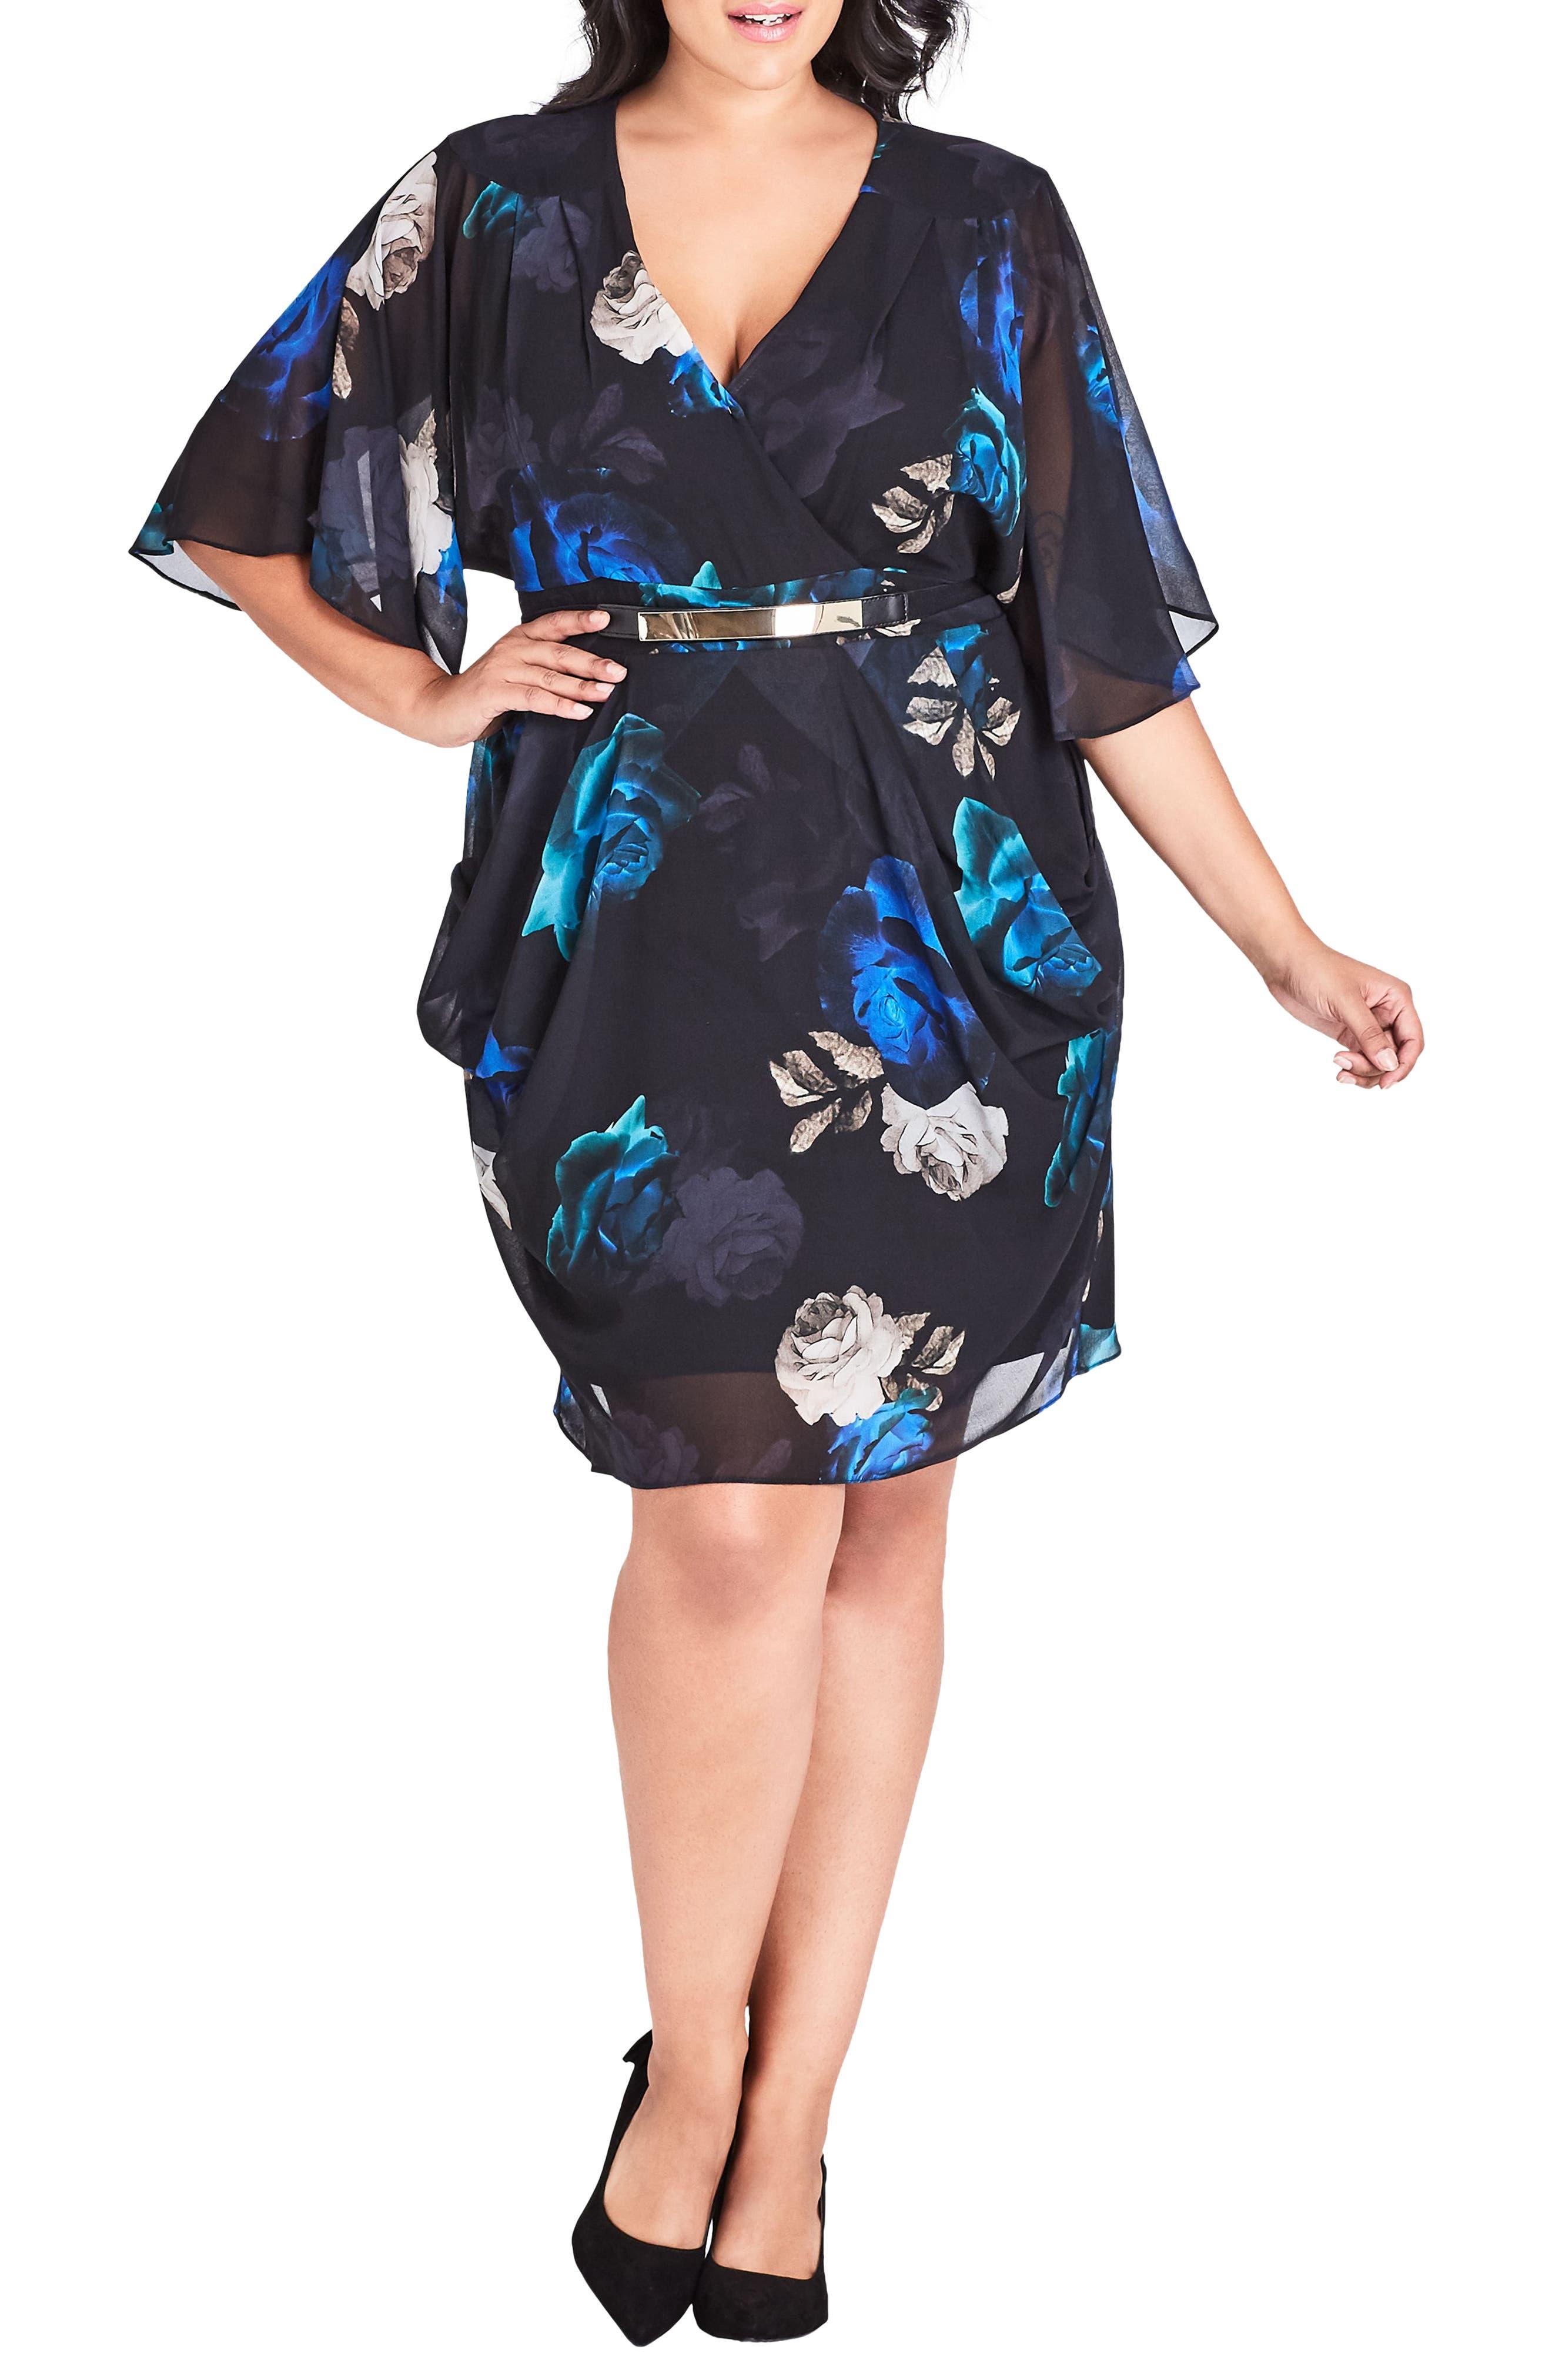 Plus Size City Chic Electric Rose Dress